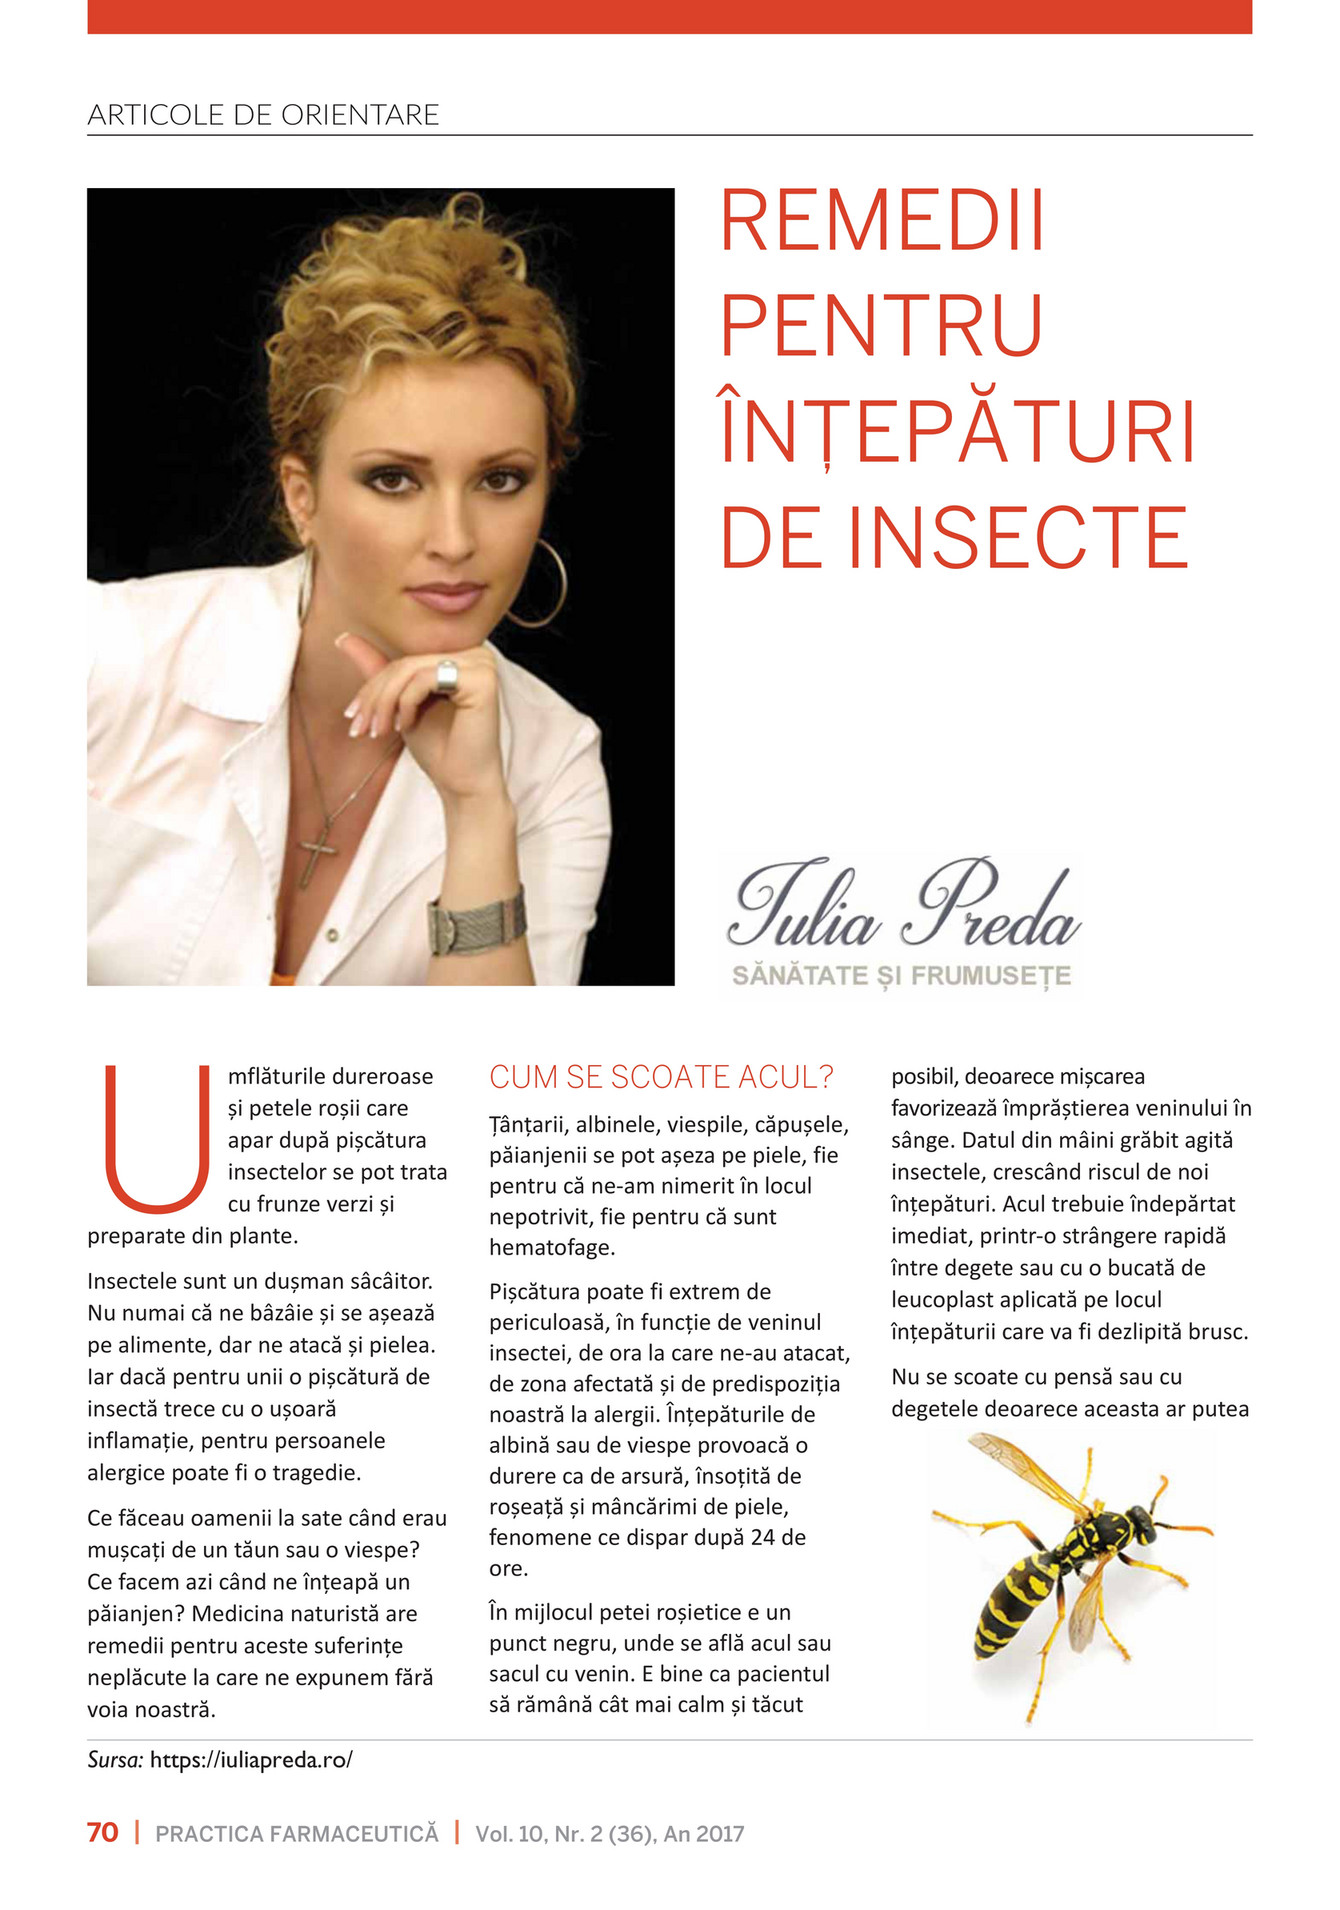 insectele pot fi mitol)